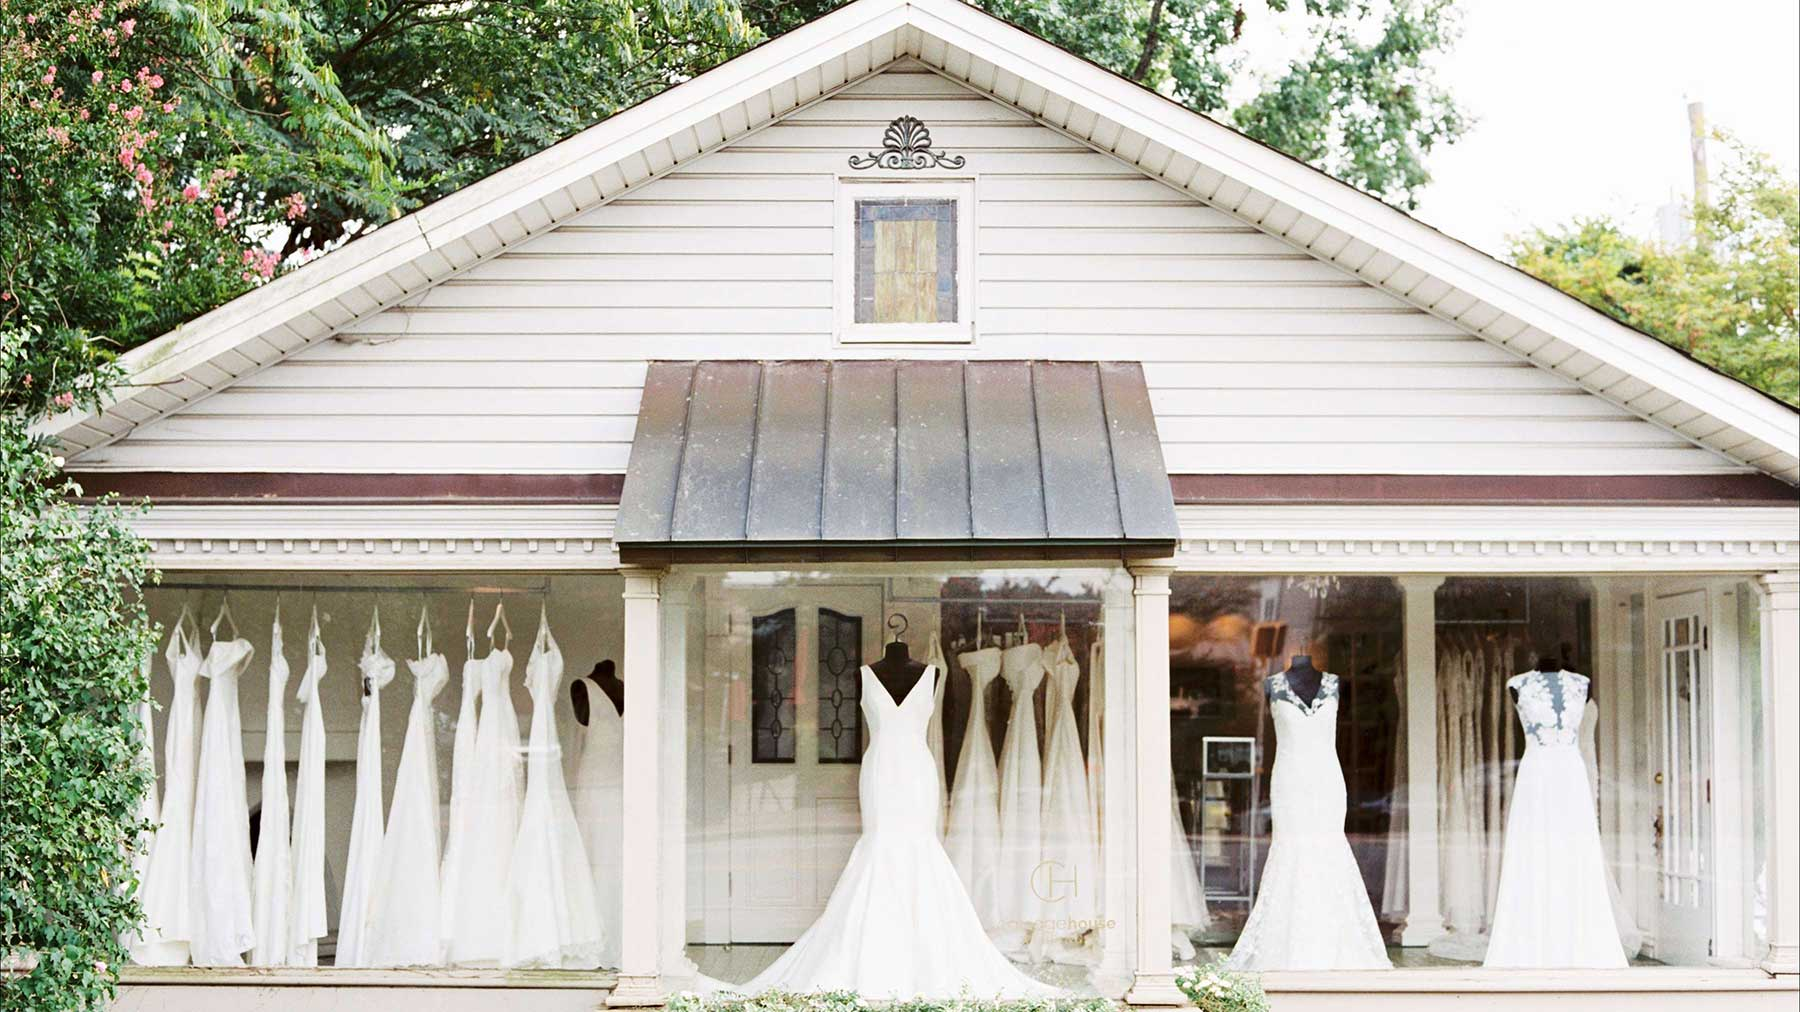 Bridal Boutique Birmingham Al Carriage House Weddings